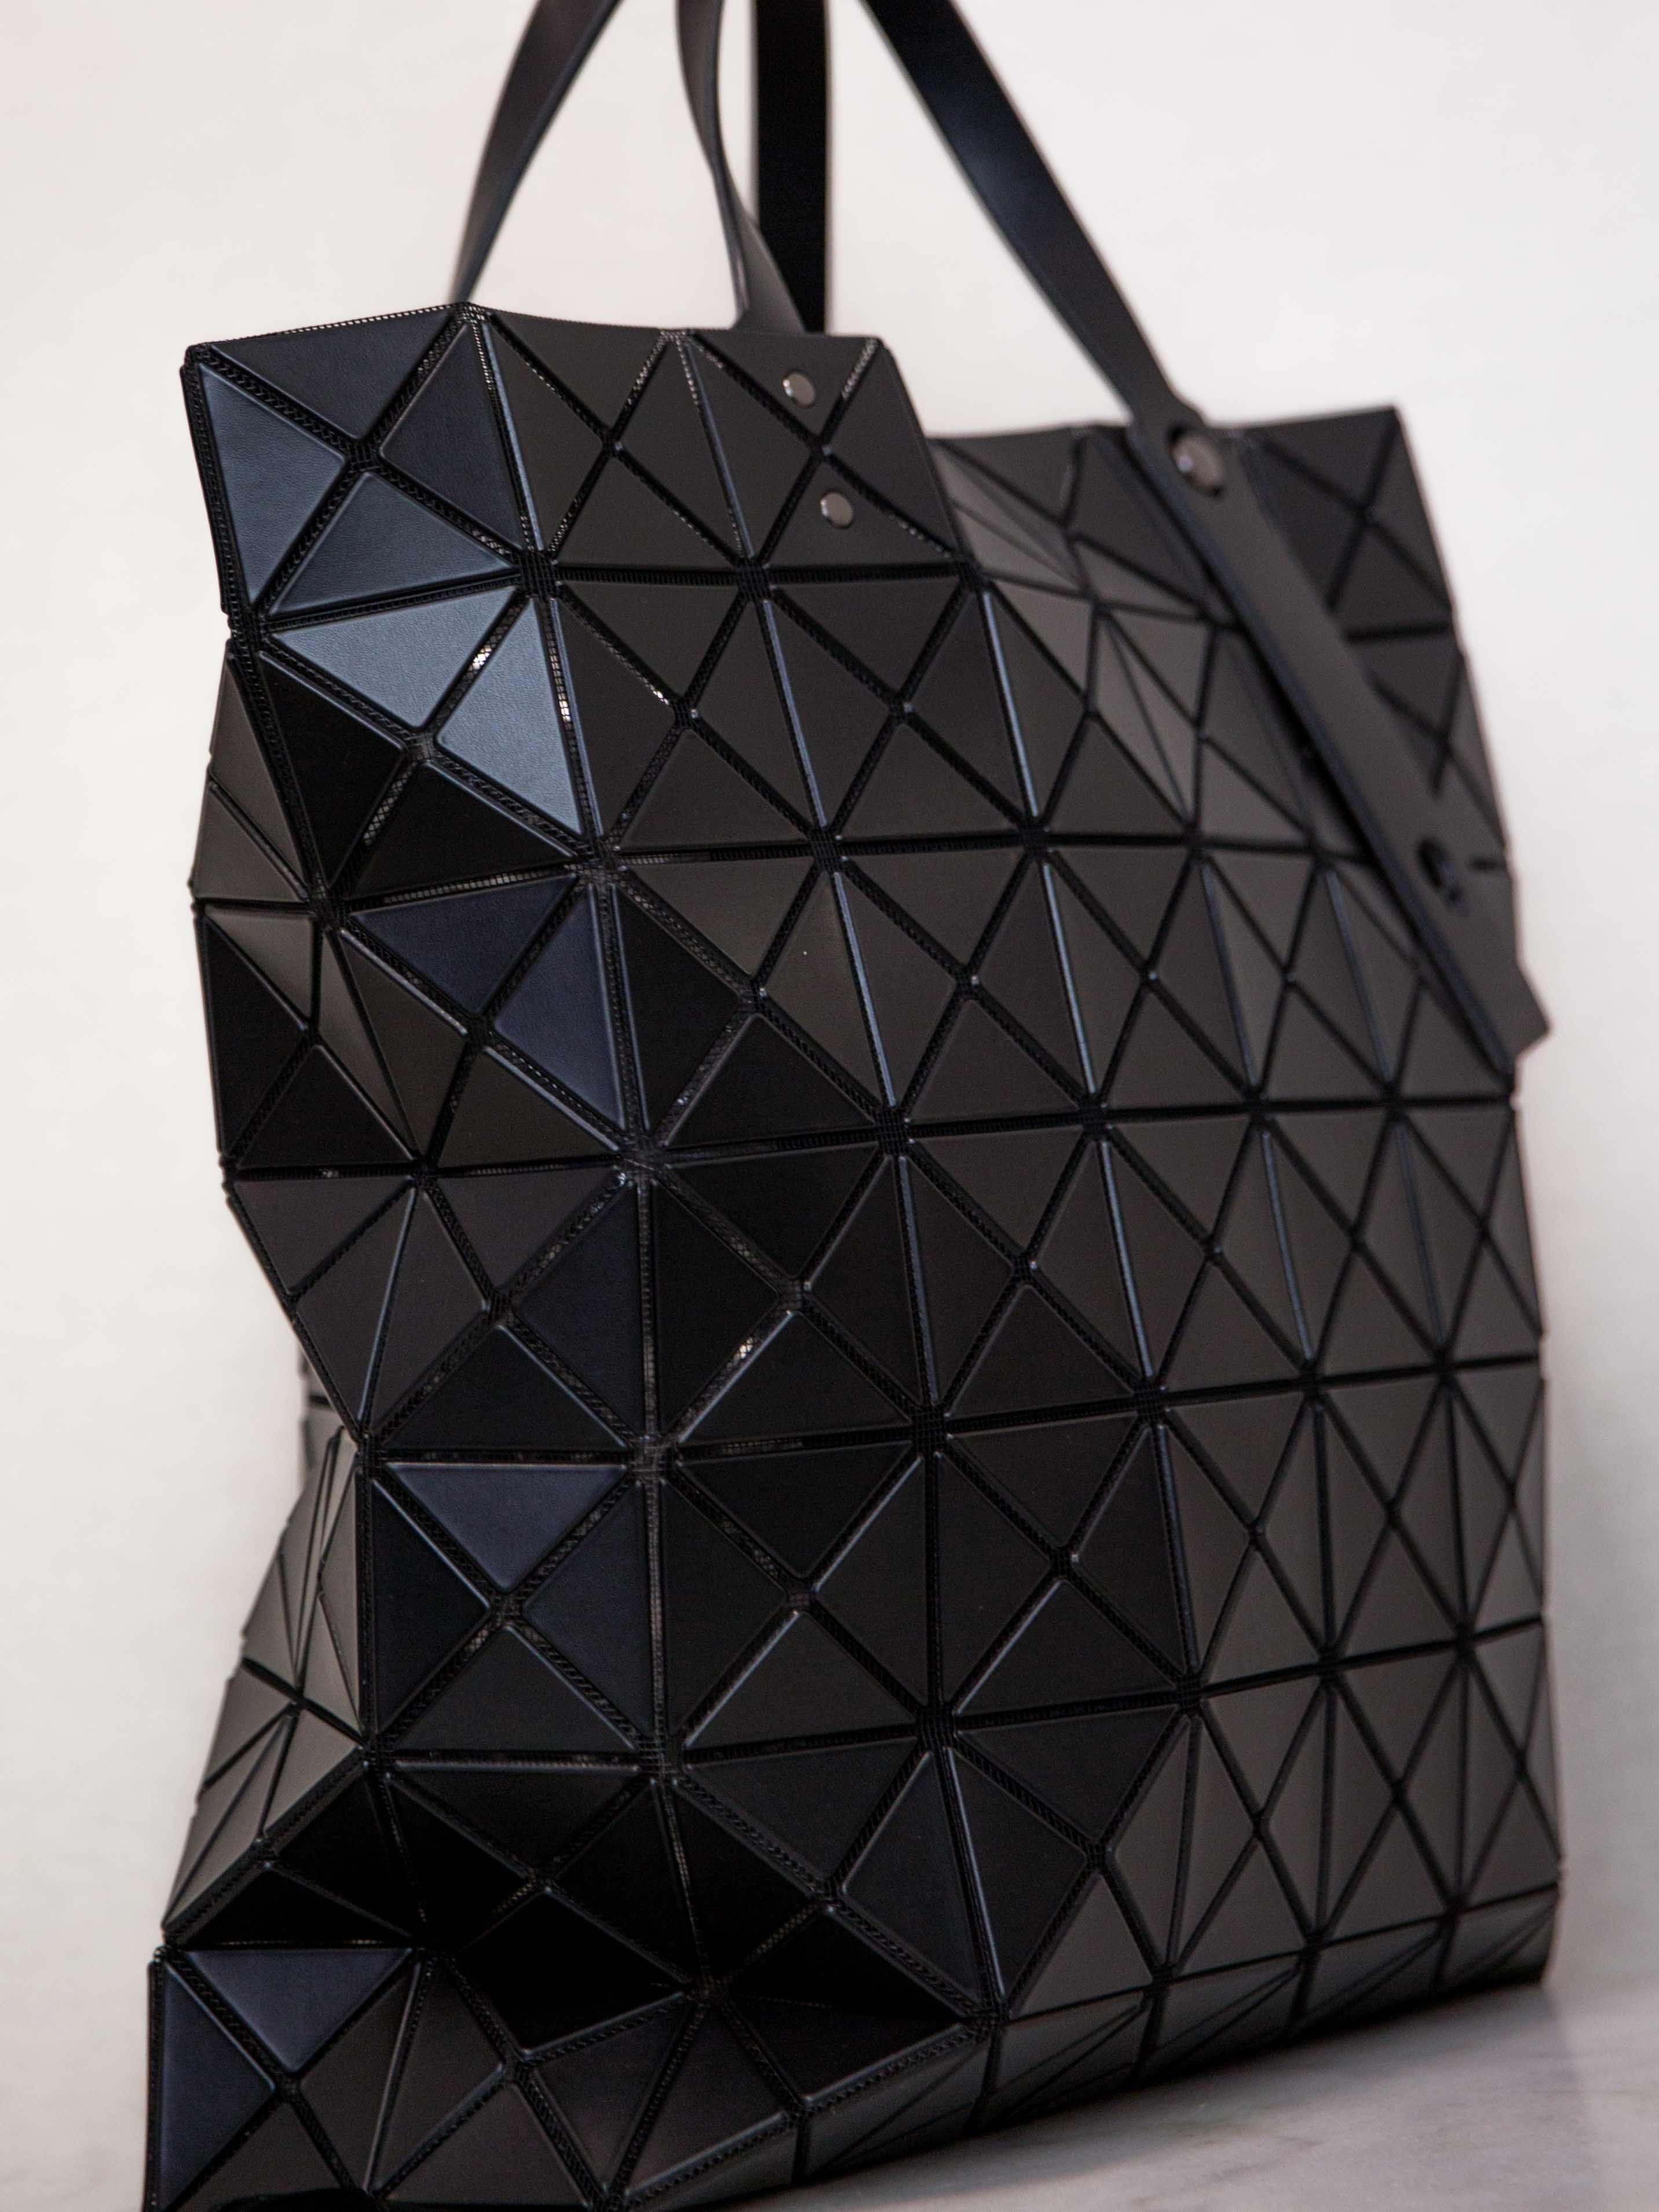 BAO BAO ISSEY MIYAKE Lucent Matte Oversized Tote Bag - Black ... a66697a630e03